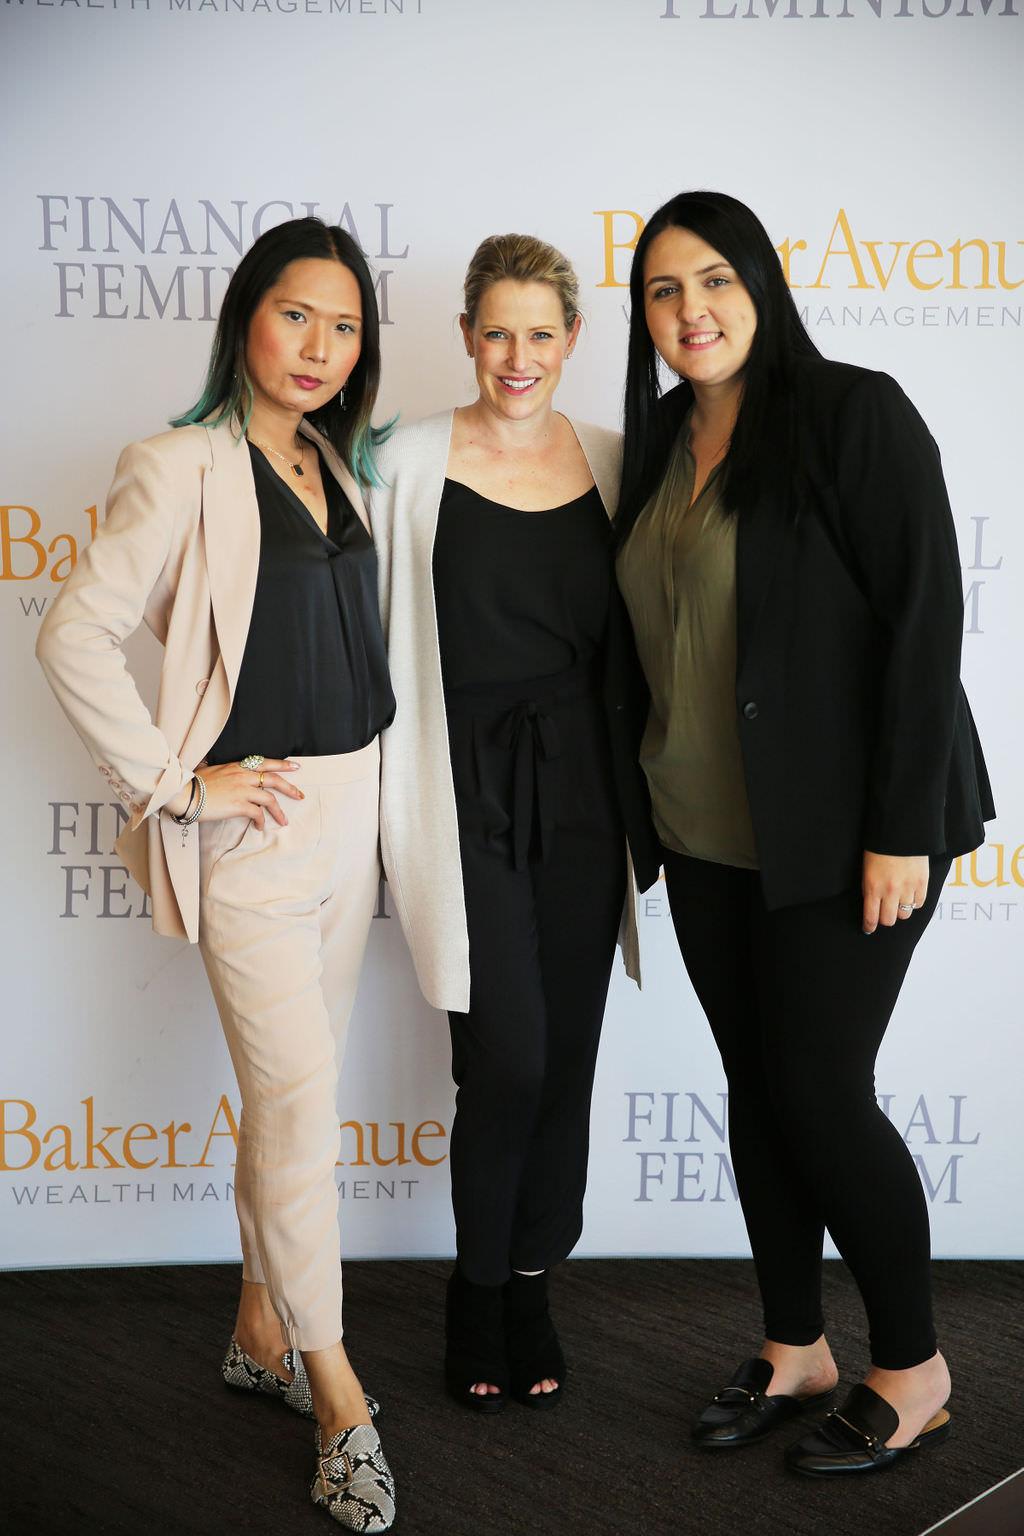 Financial Feminism Event